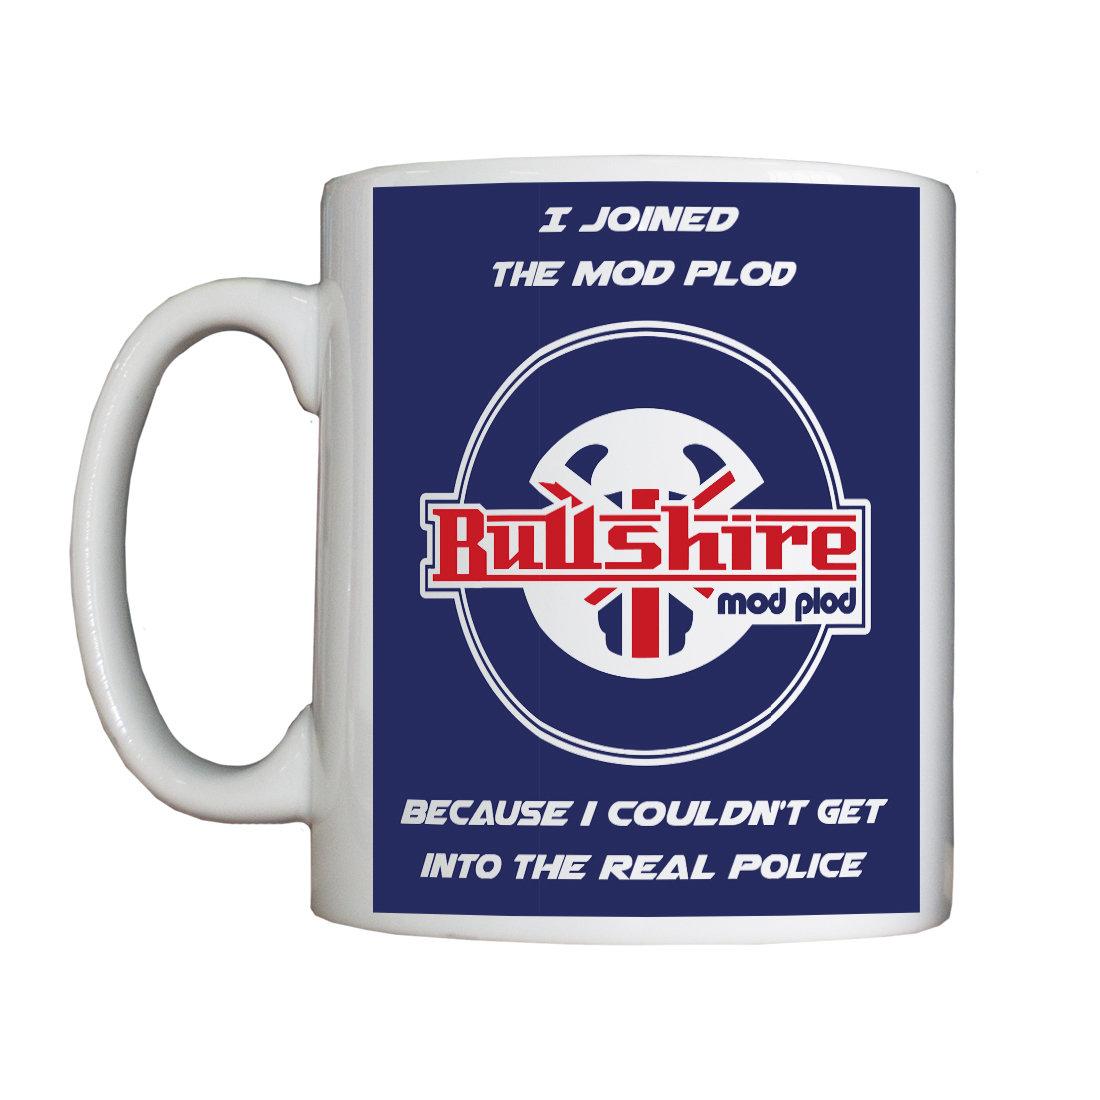 Personalised 'I Joined the Mo d Plod' Drinking Vessel (Mug) NewModefPlodMug